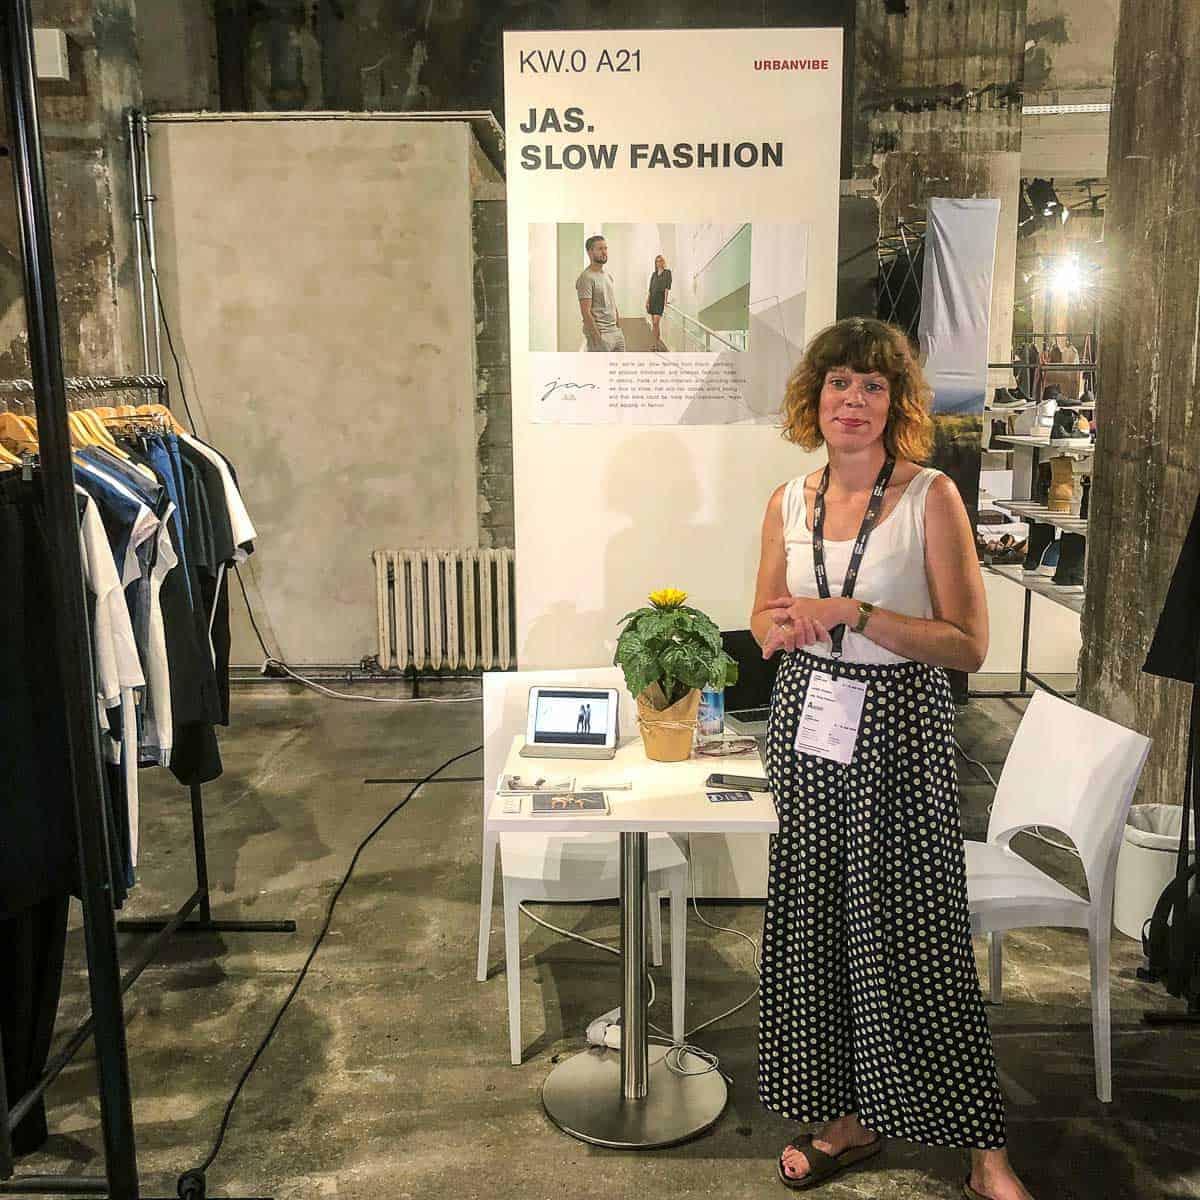 jas.slowfashion @ Ethical Fashion Show